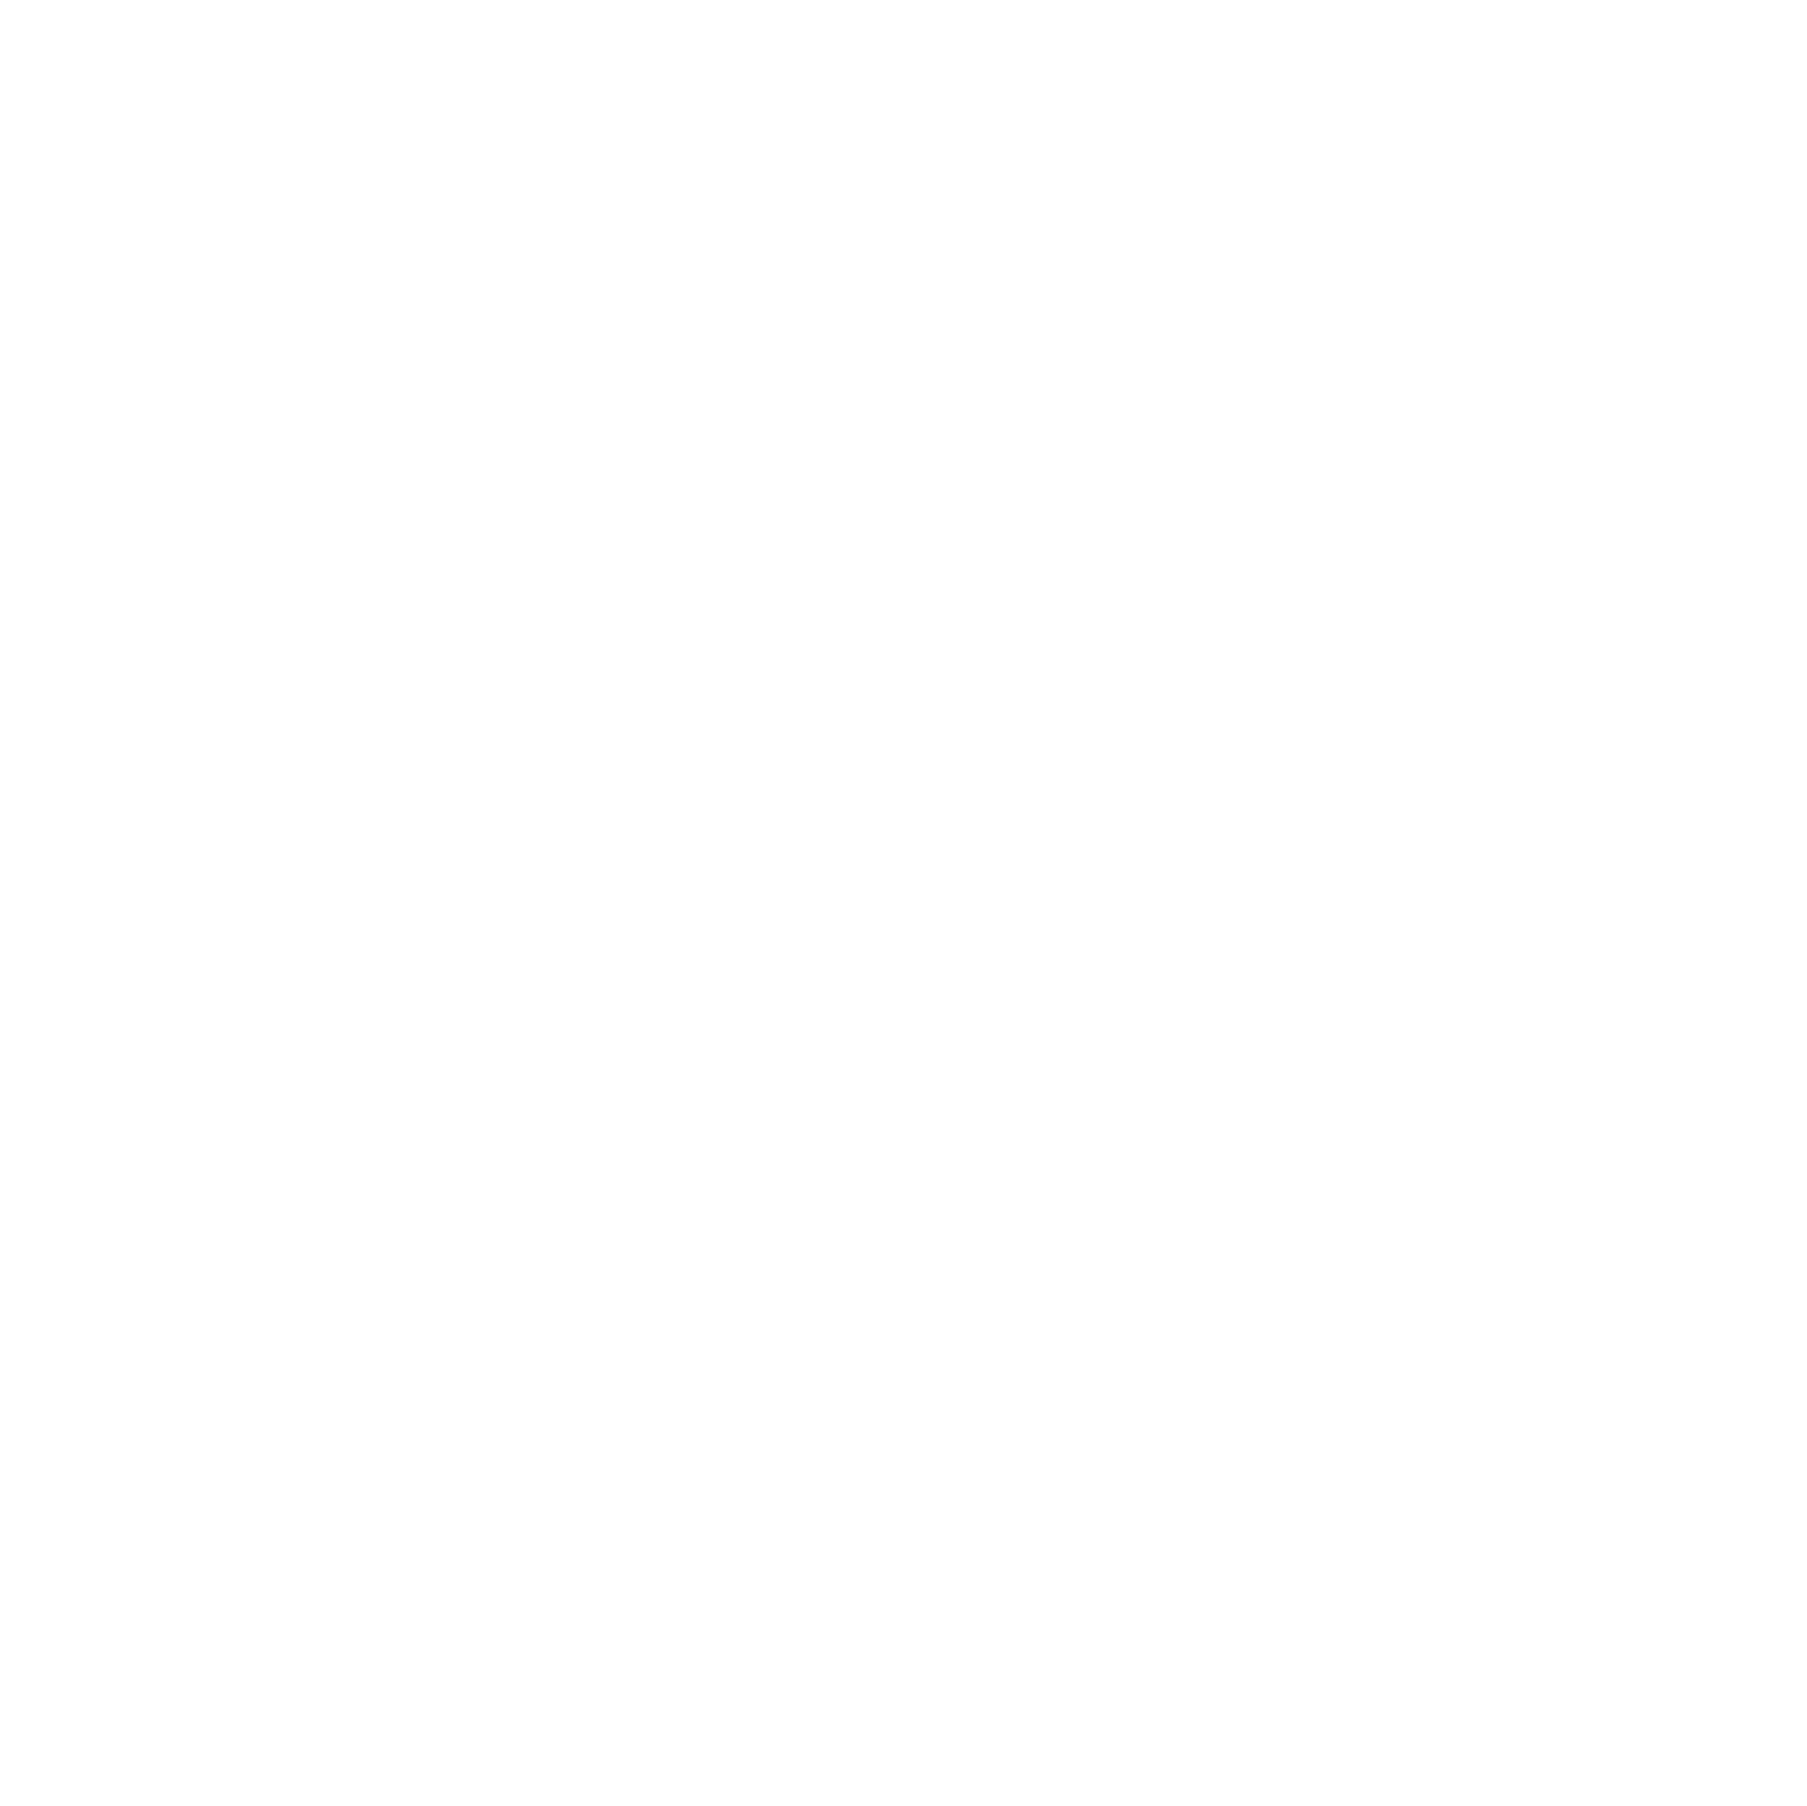 Hawthorn 1 550mm x 550mm